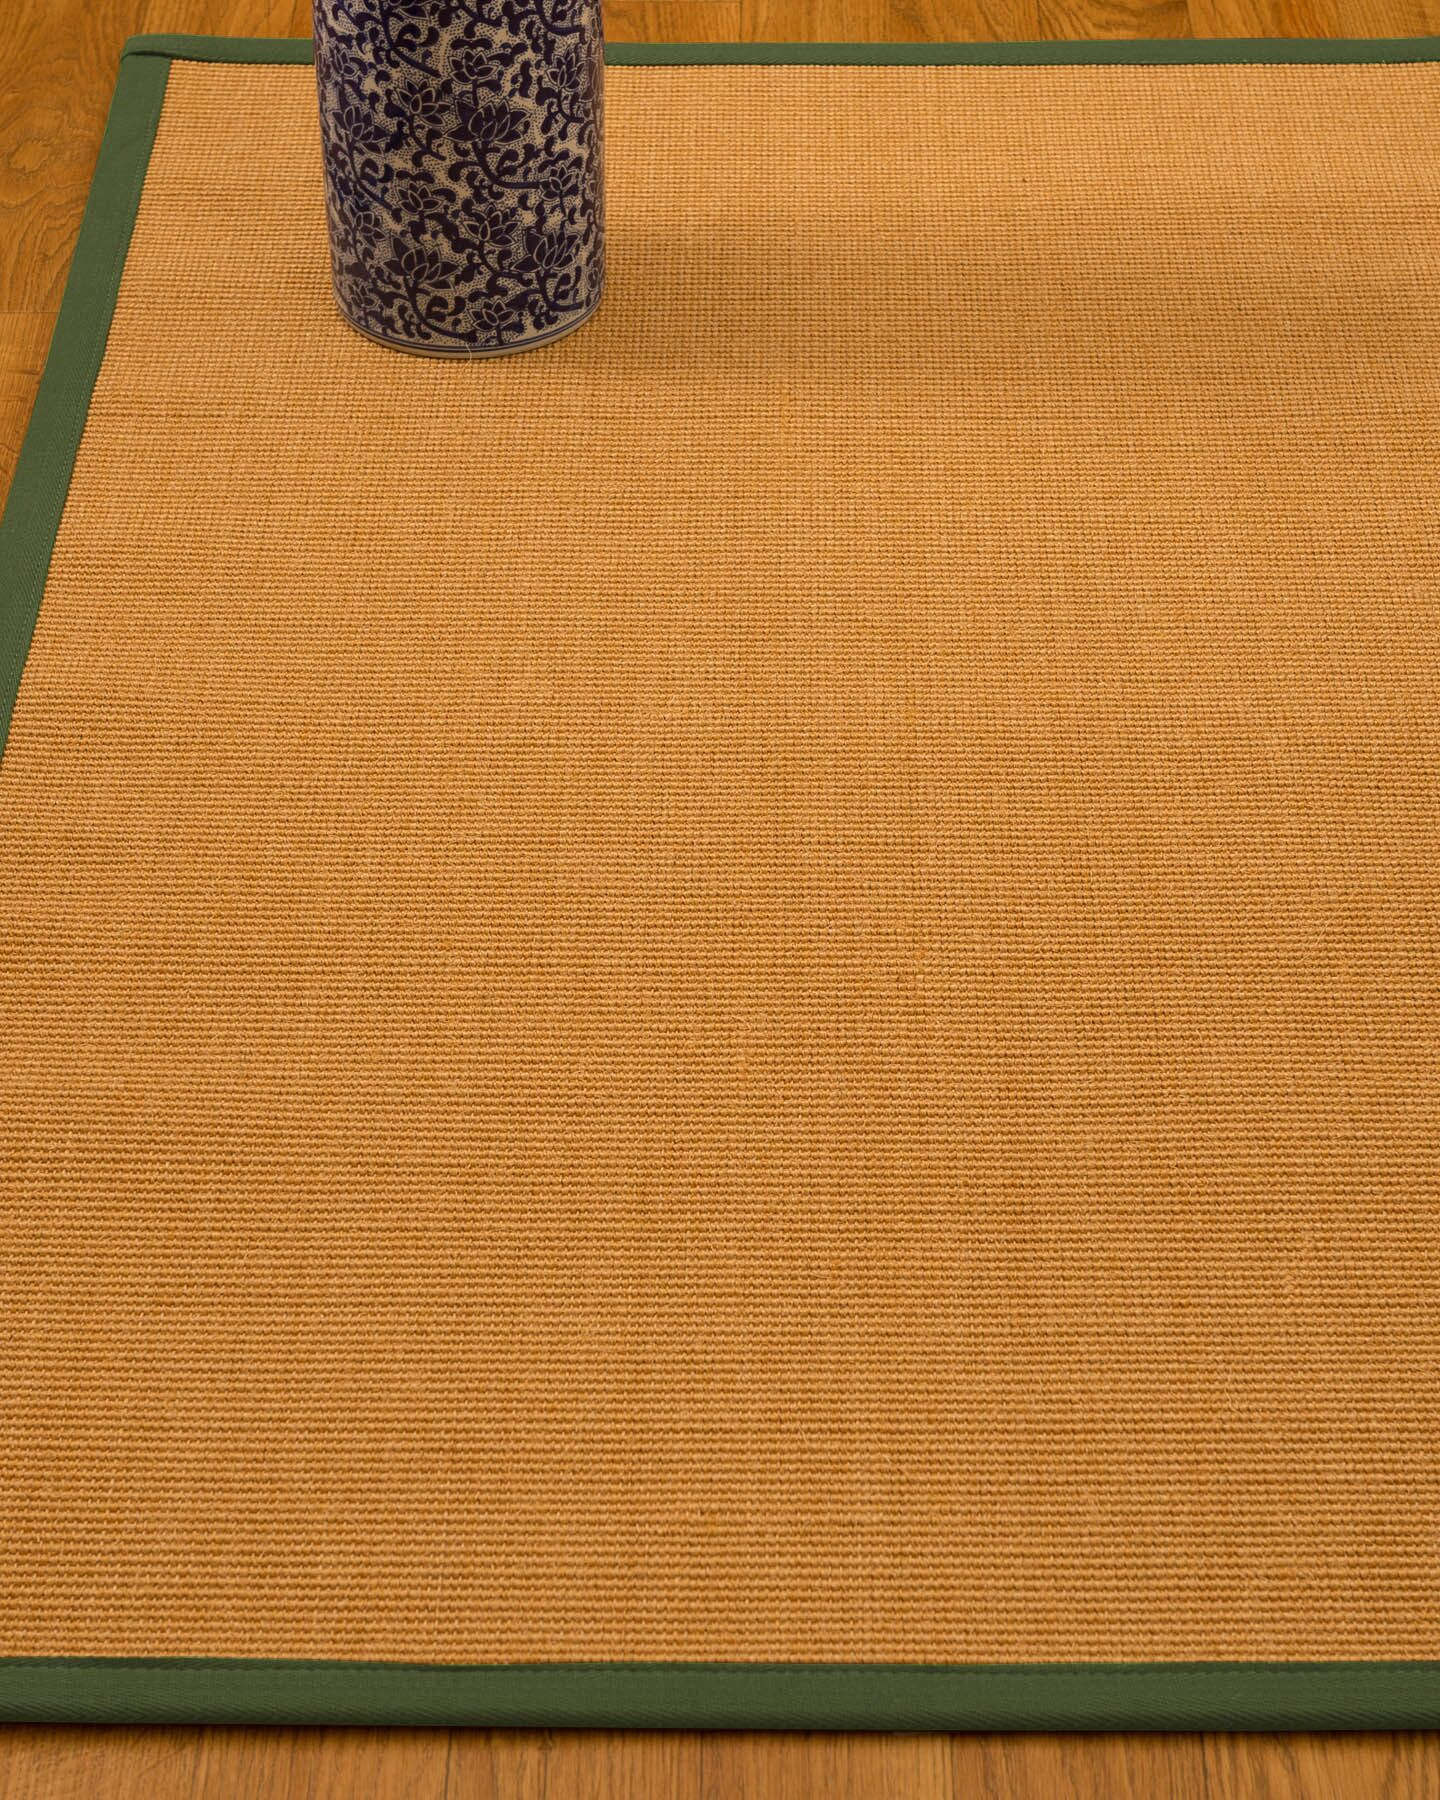 Gregory Hand-Woven Beige Area Rug Rug Size: Rectangle 4' x 6'